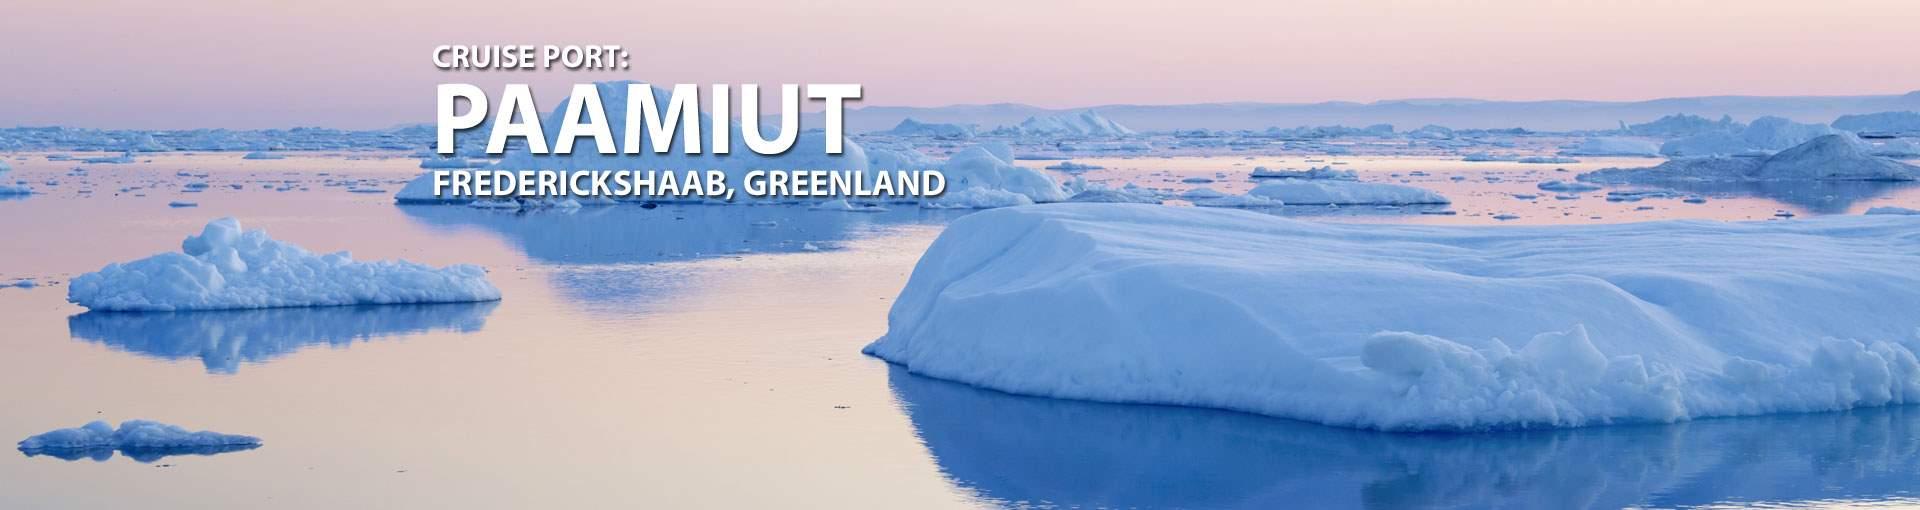 Cruises to Paamiut (Frederickshaab), Greenland